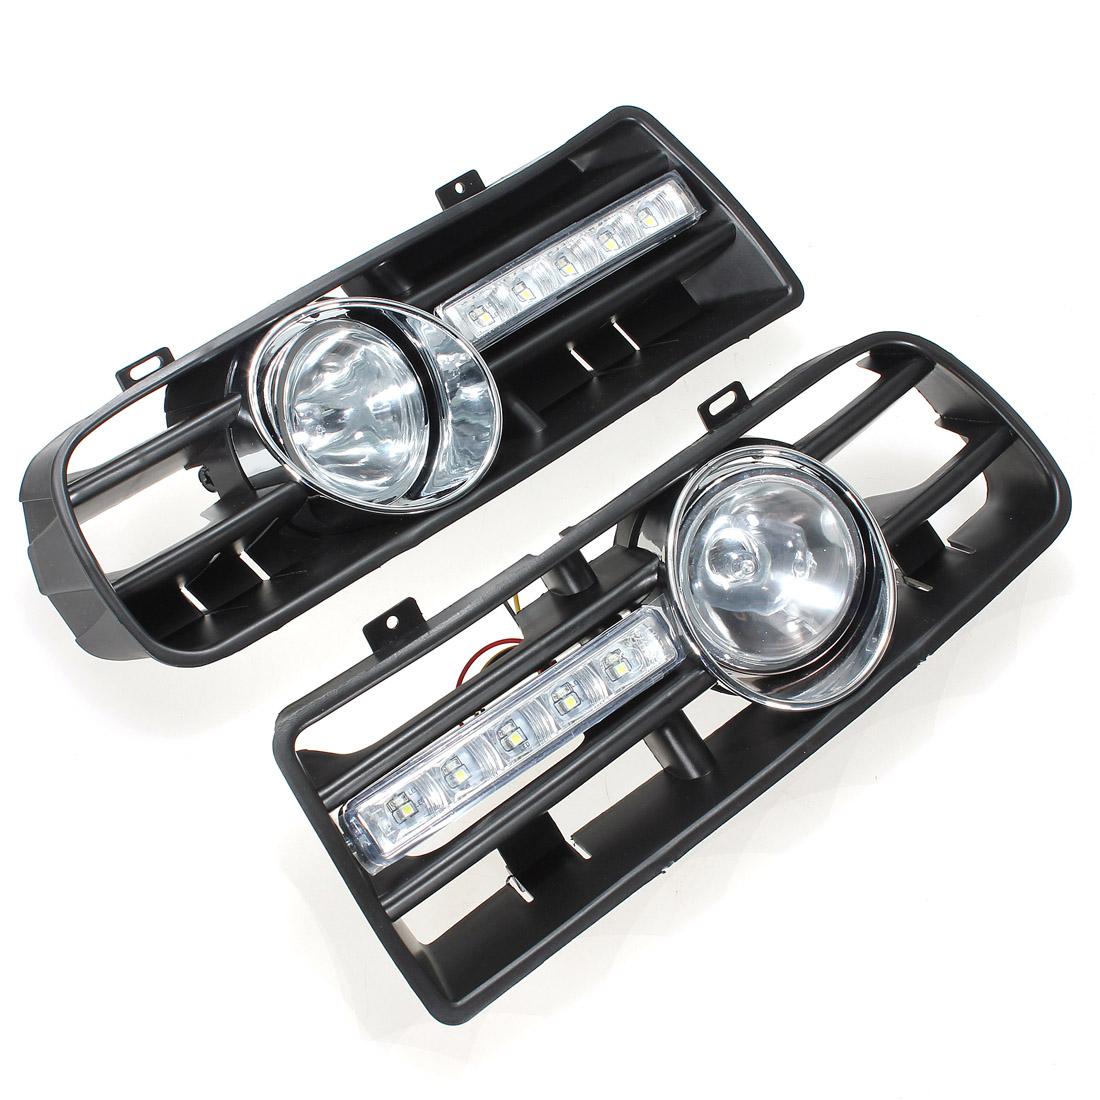 2 x led phares antibrouillard projecteur grille pare chocs voiture pr 97 06 vw golf 4 mk4 iv. Black Bedroom Furniture Sets. Home Design Ideas